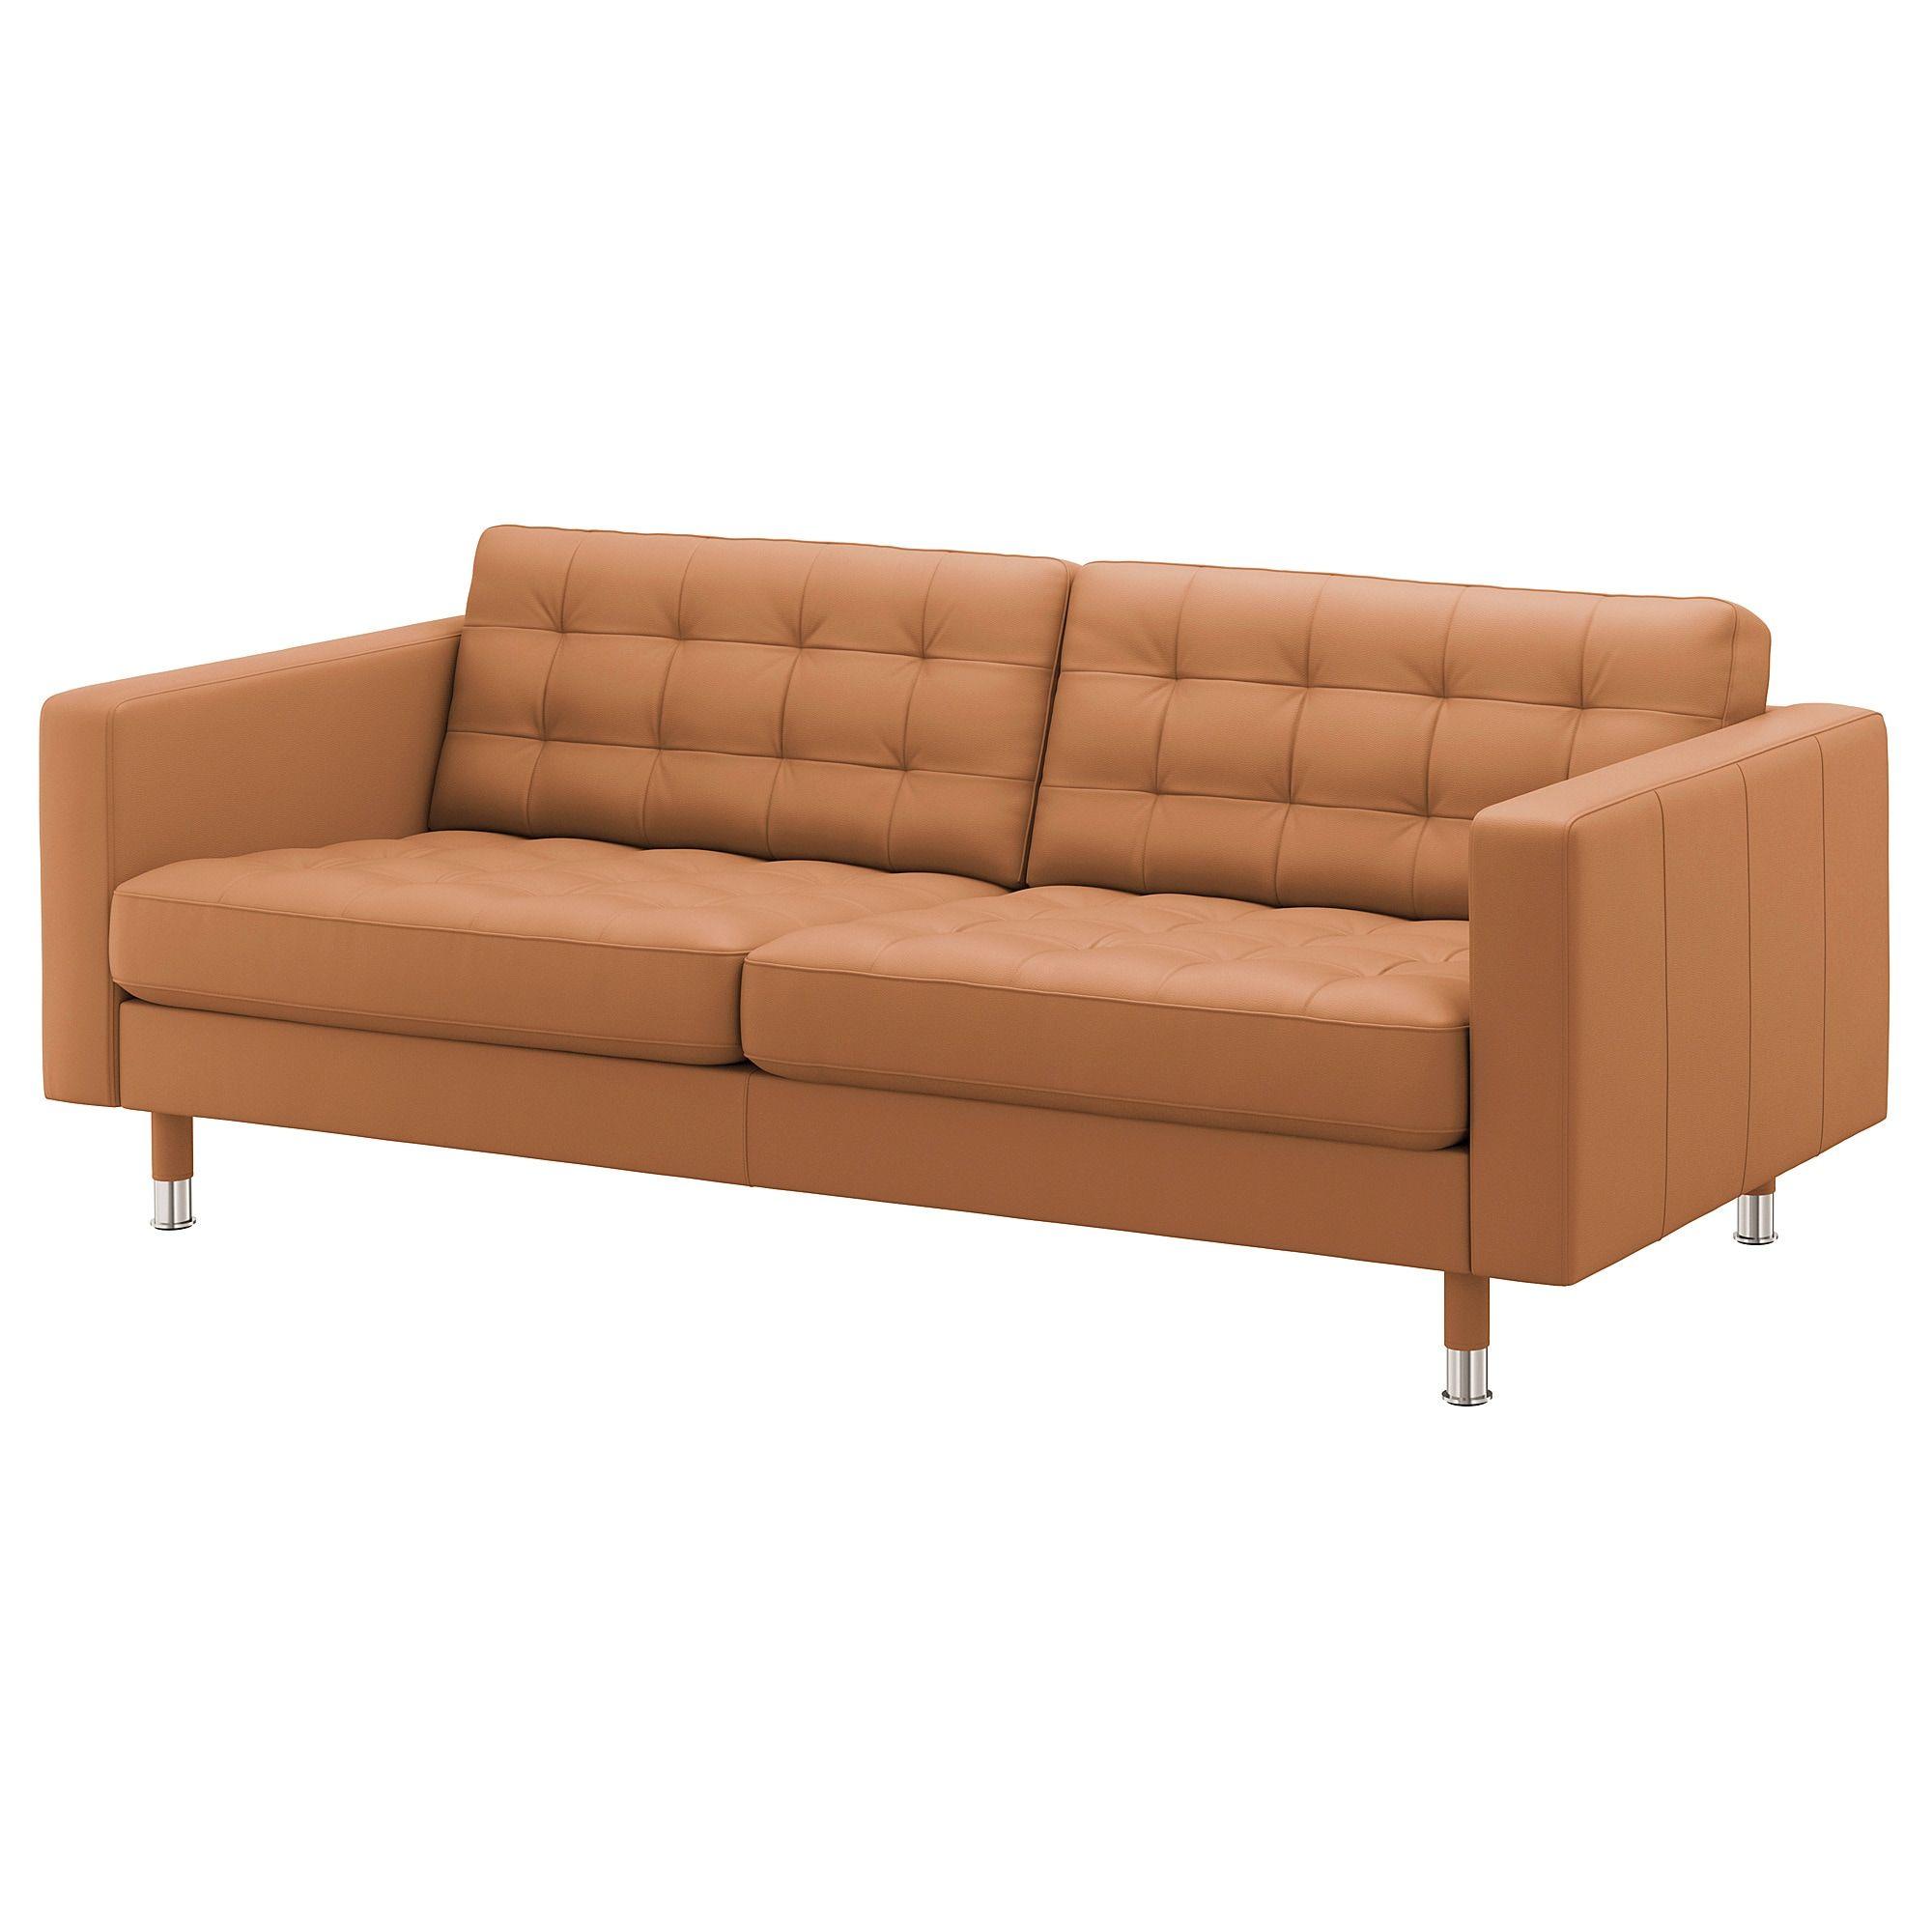 LANDSKRONA Sofa – Grann/Bomstad golden brown/metal – IKEA